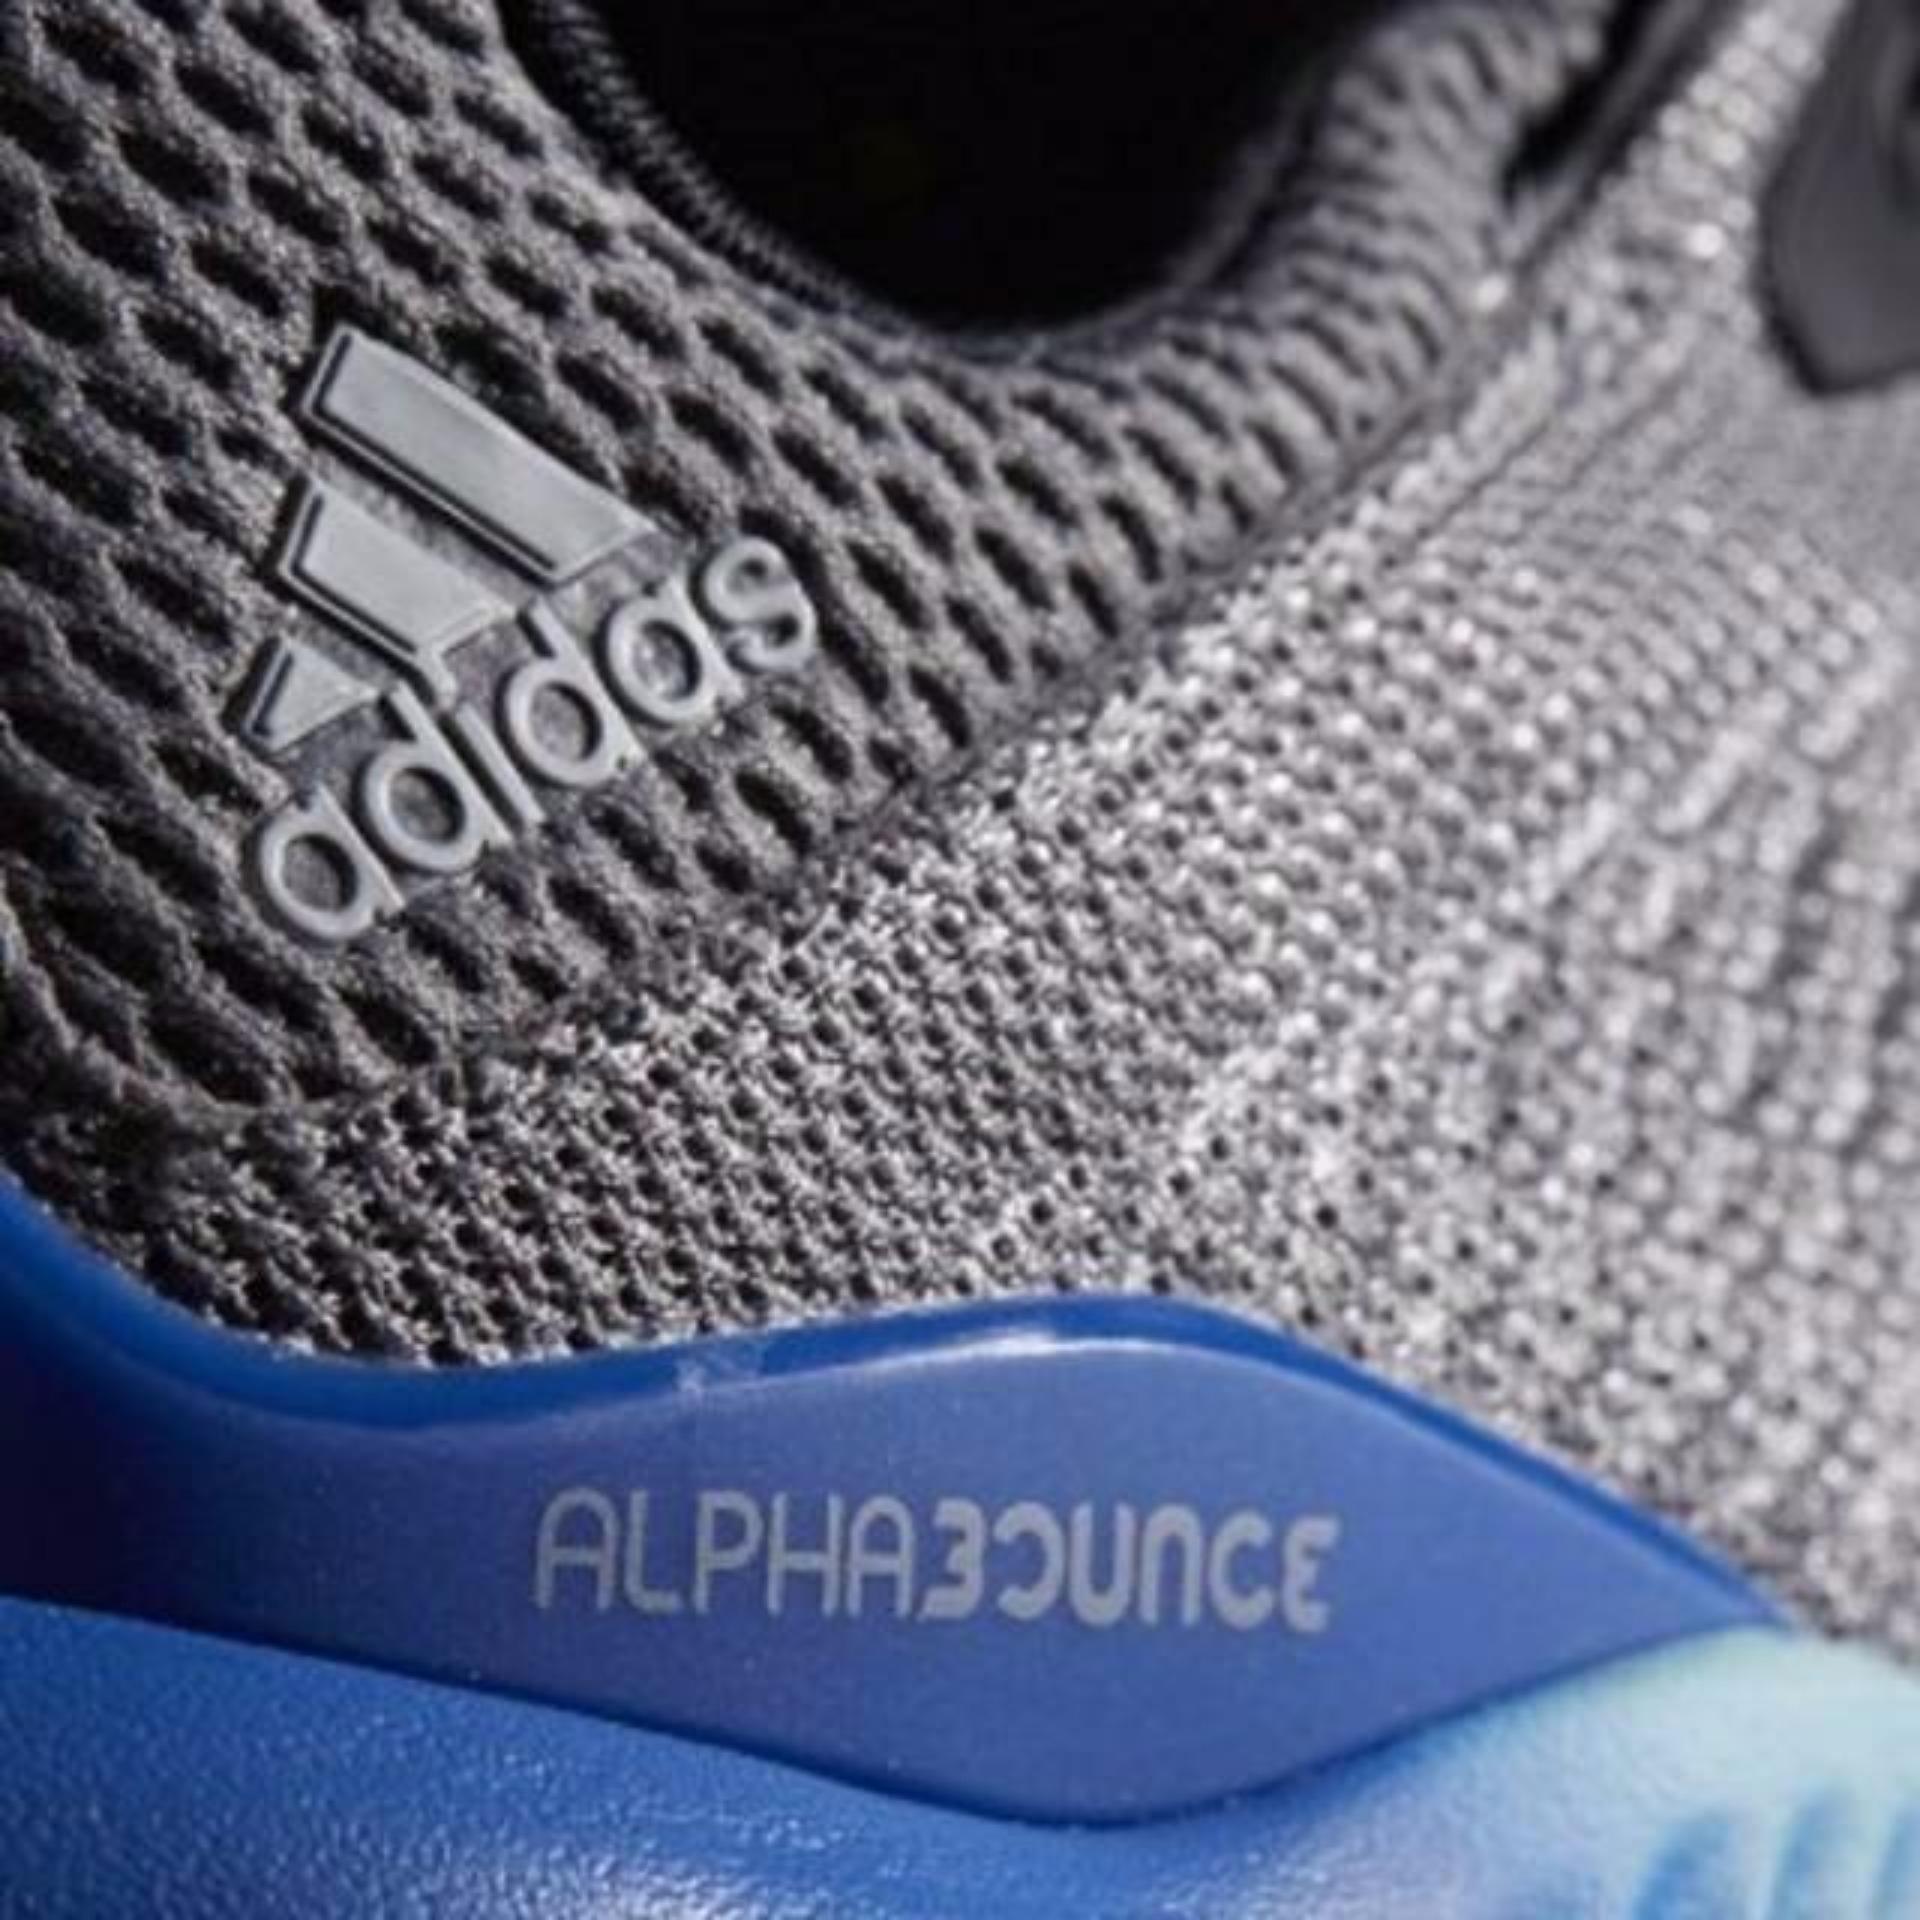 Adidas Sepatu Running Alphabounce Bb9035 Abu - Daftar Harga Terbaru ... 16c953db7d